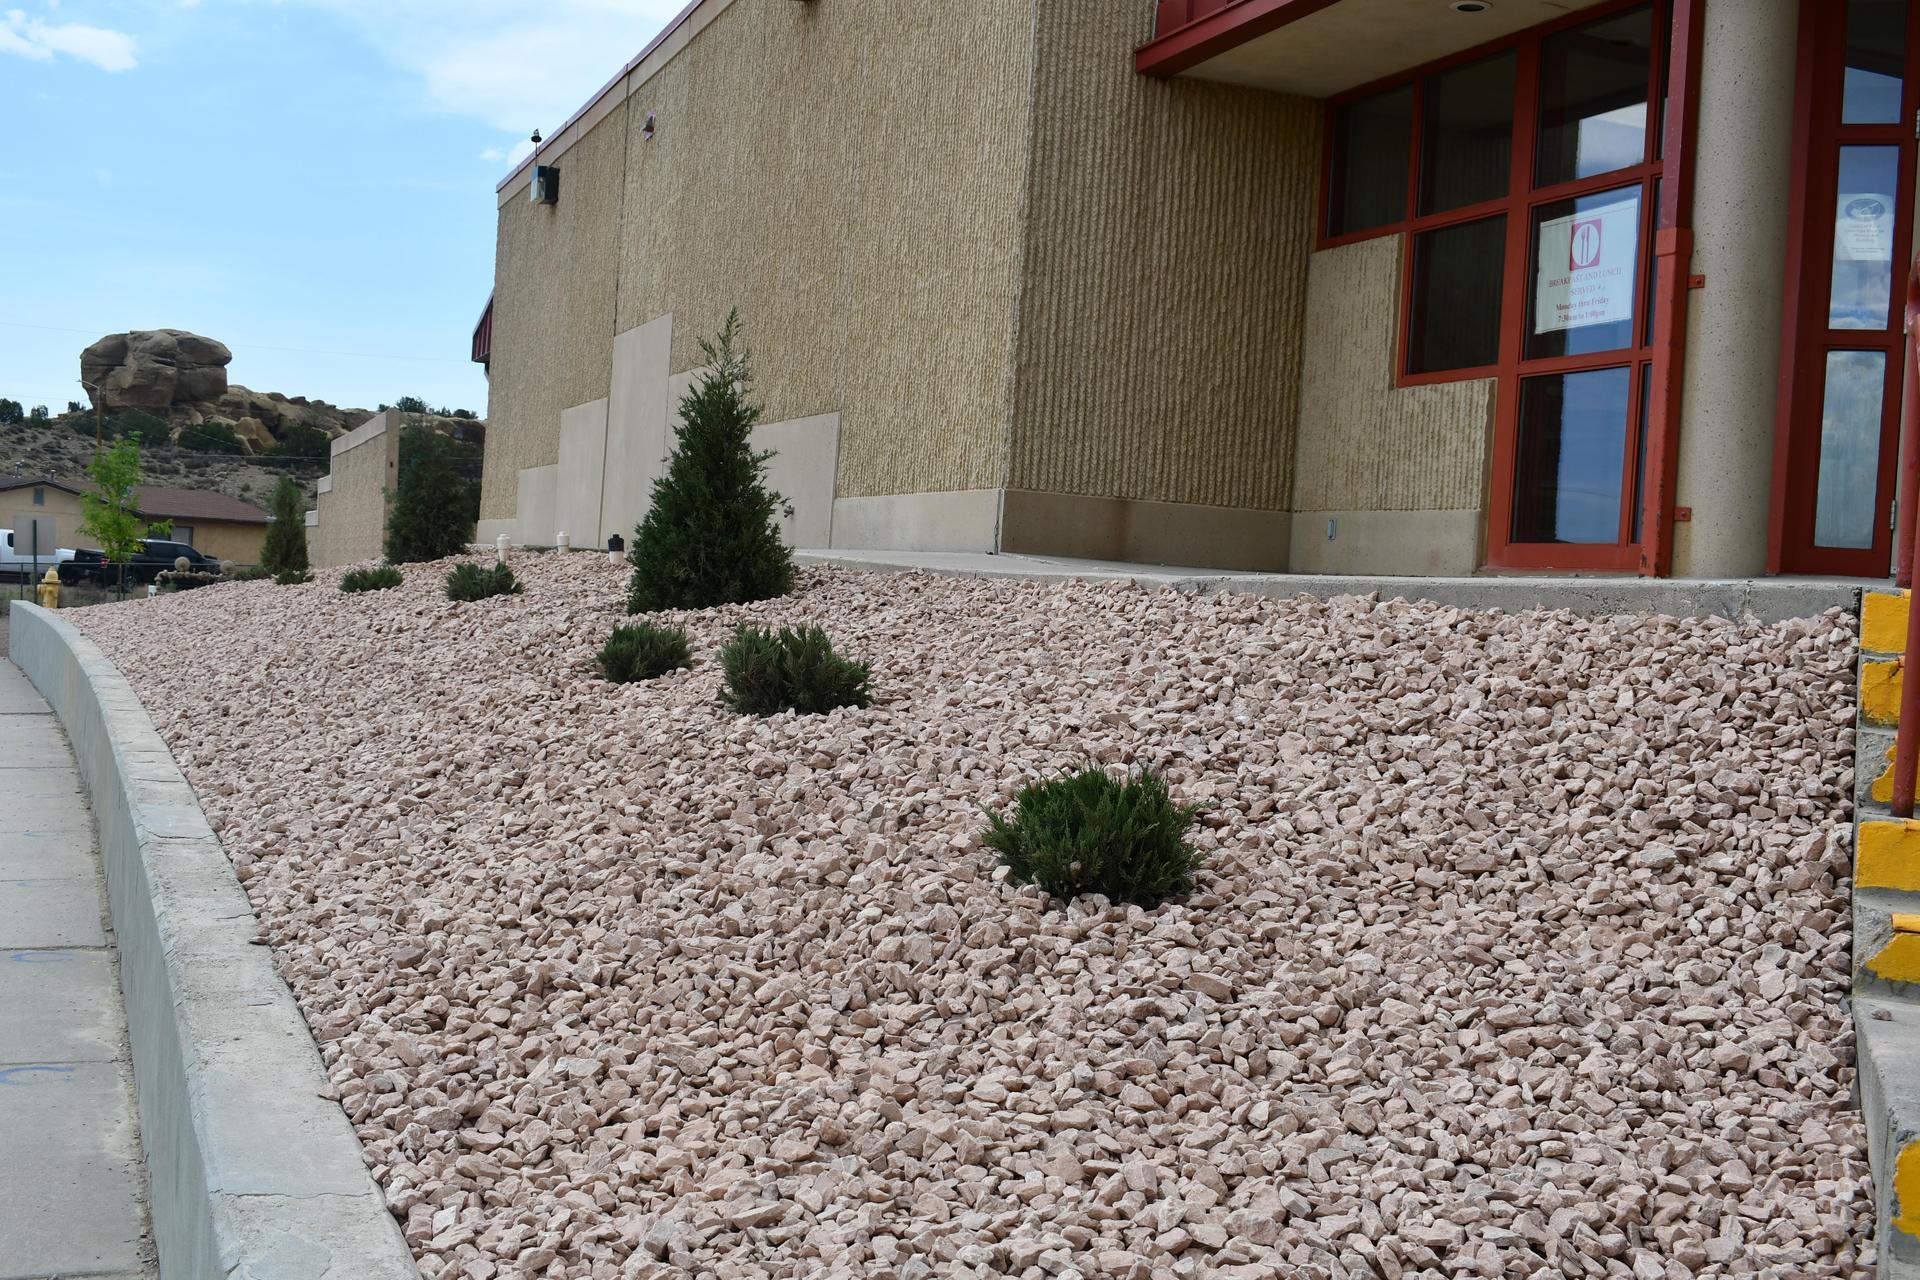 Stagecoach Elementary